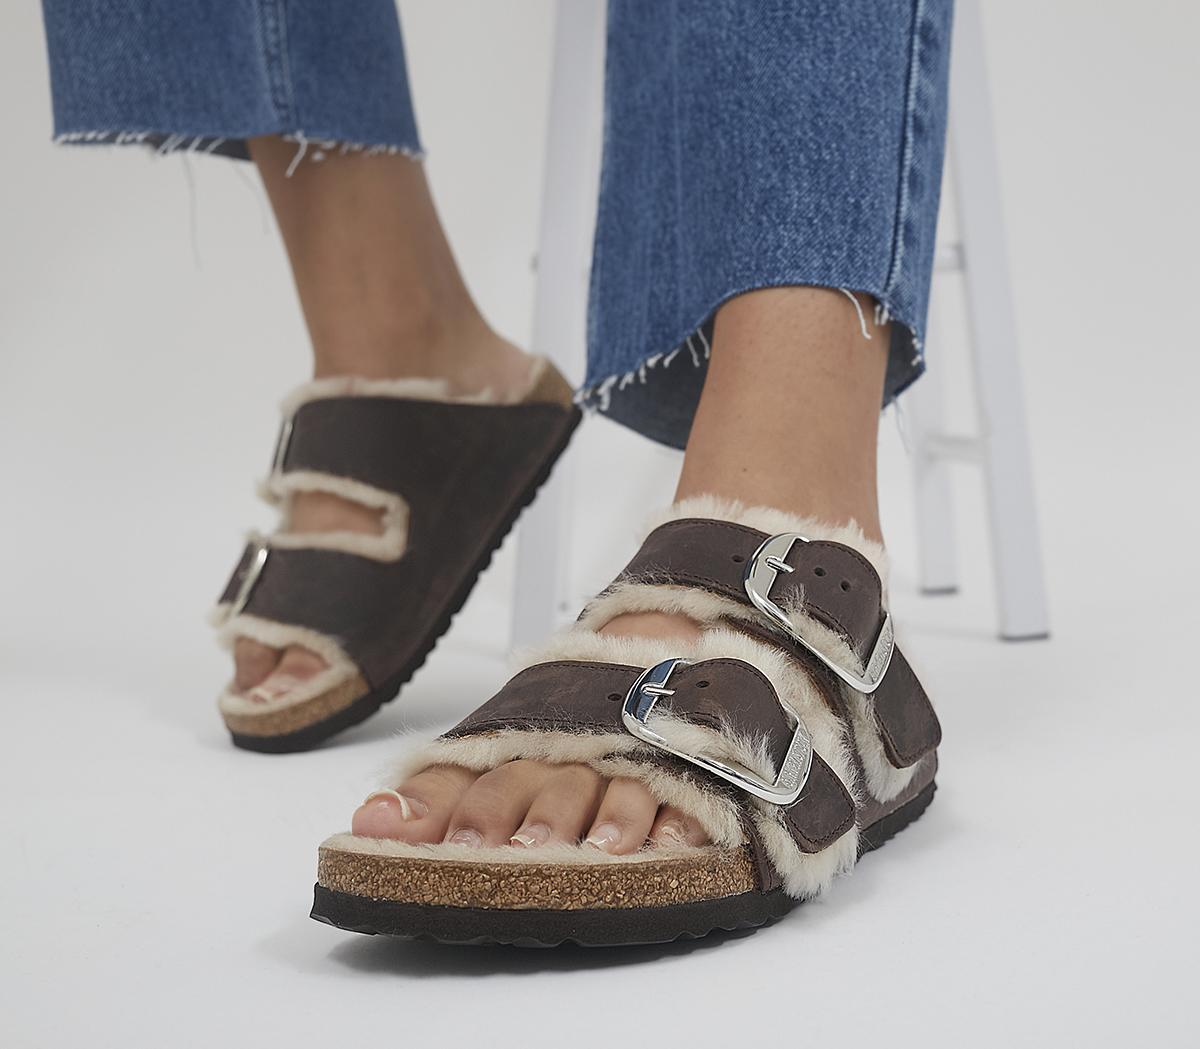 Arizona Big Buckle Shearling Sandals